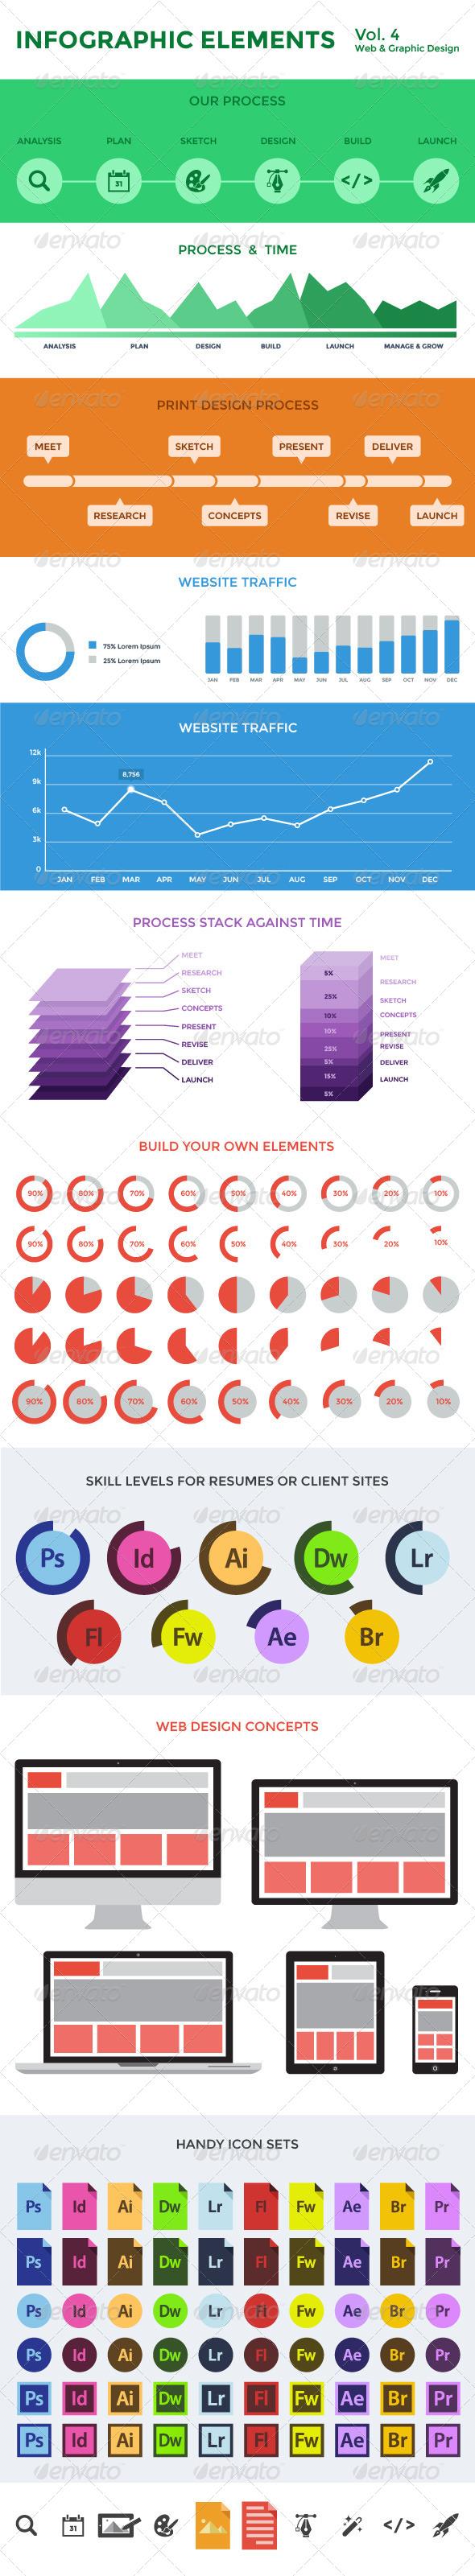 Infographic Elements - Vol. 4 - Infographics